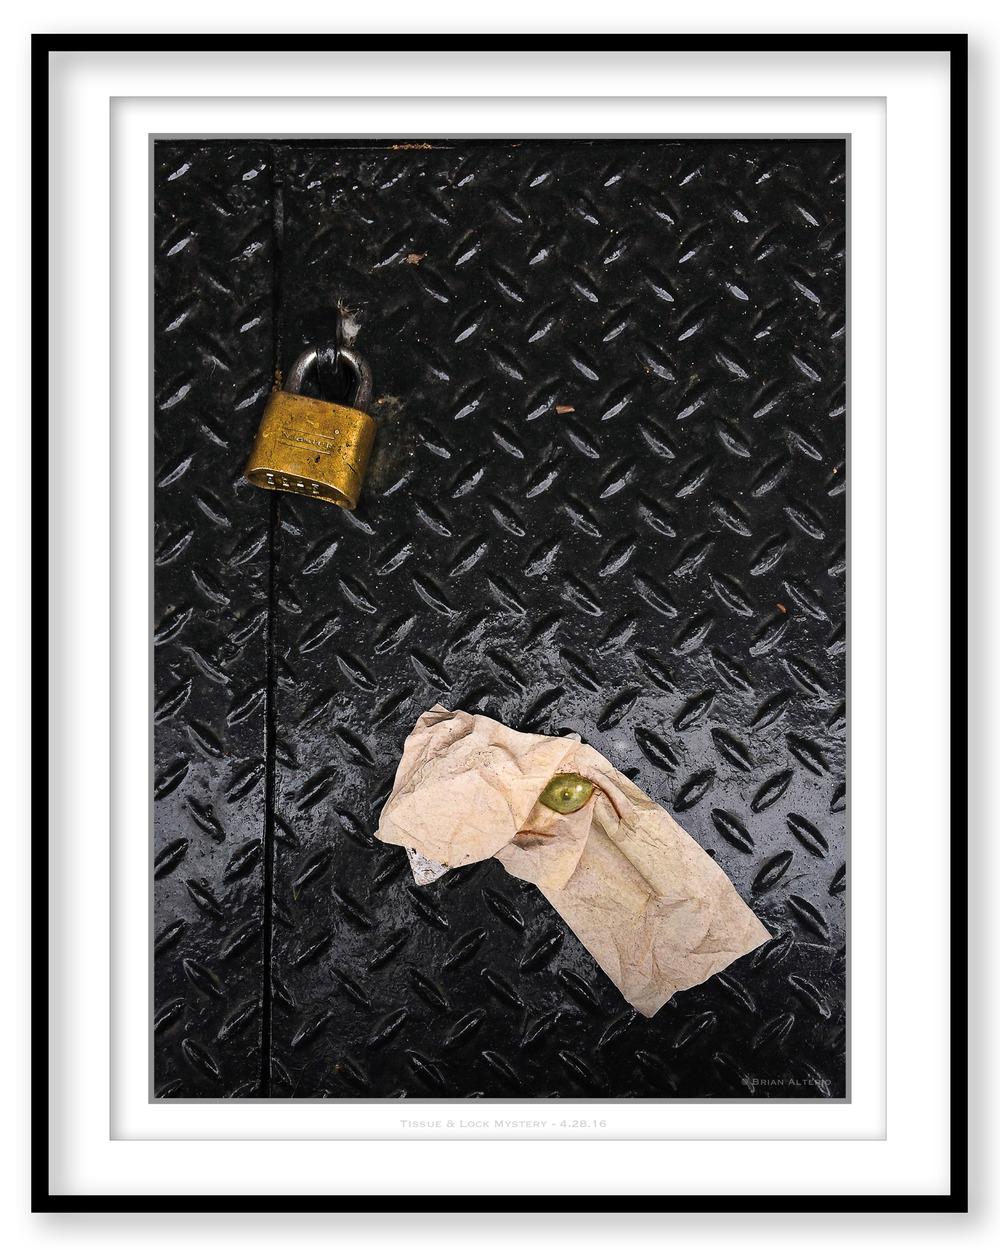 Tissue & Lock Mystery - 4.28.16 - Framed.jpg